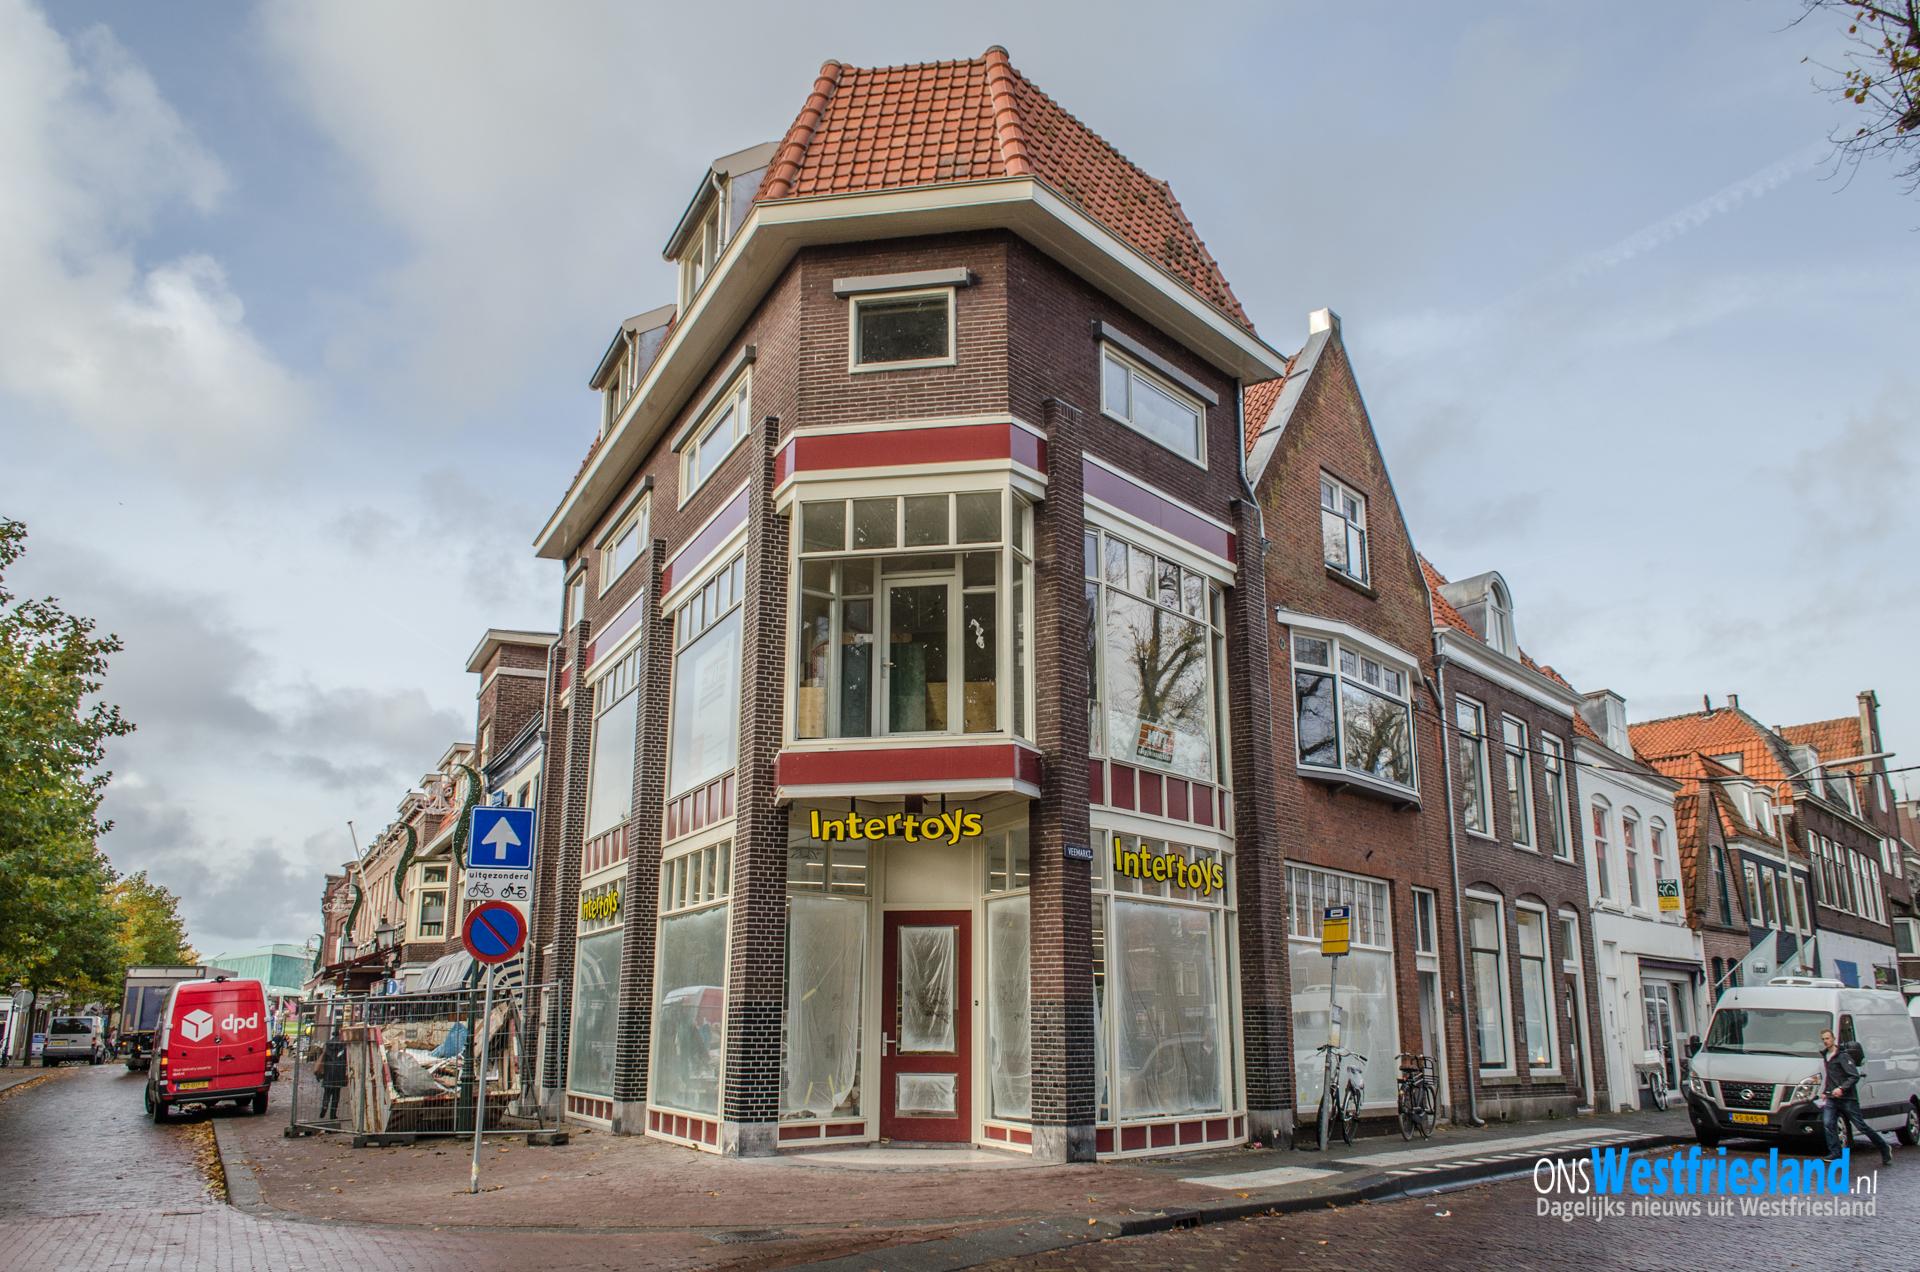 Intertoys opent 10 november proefwinkel in Hoorn